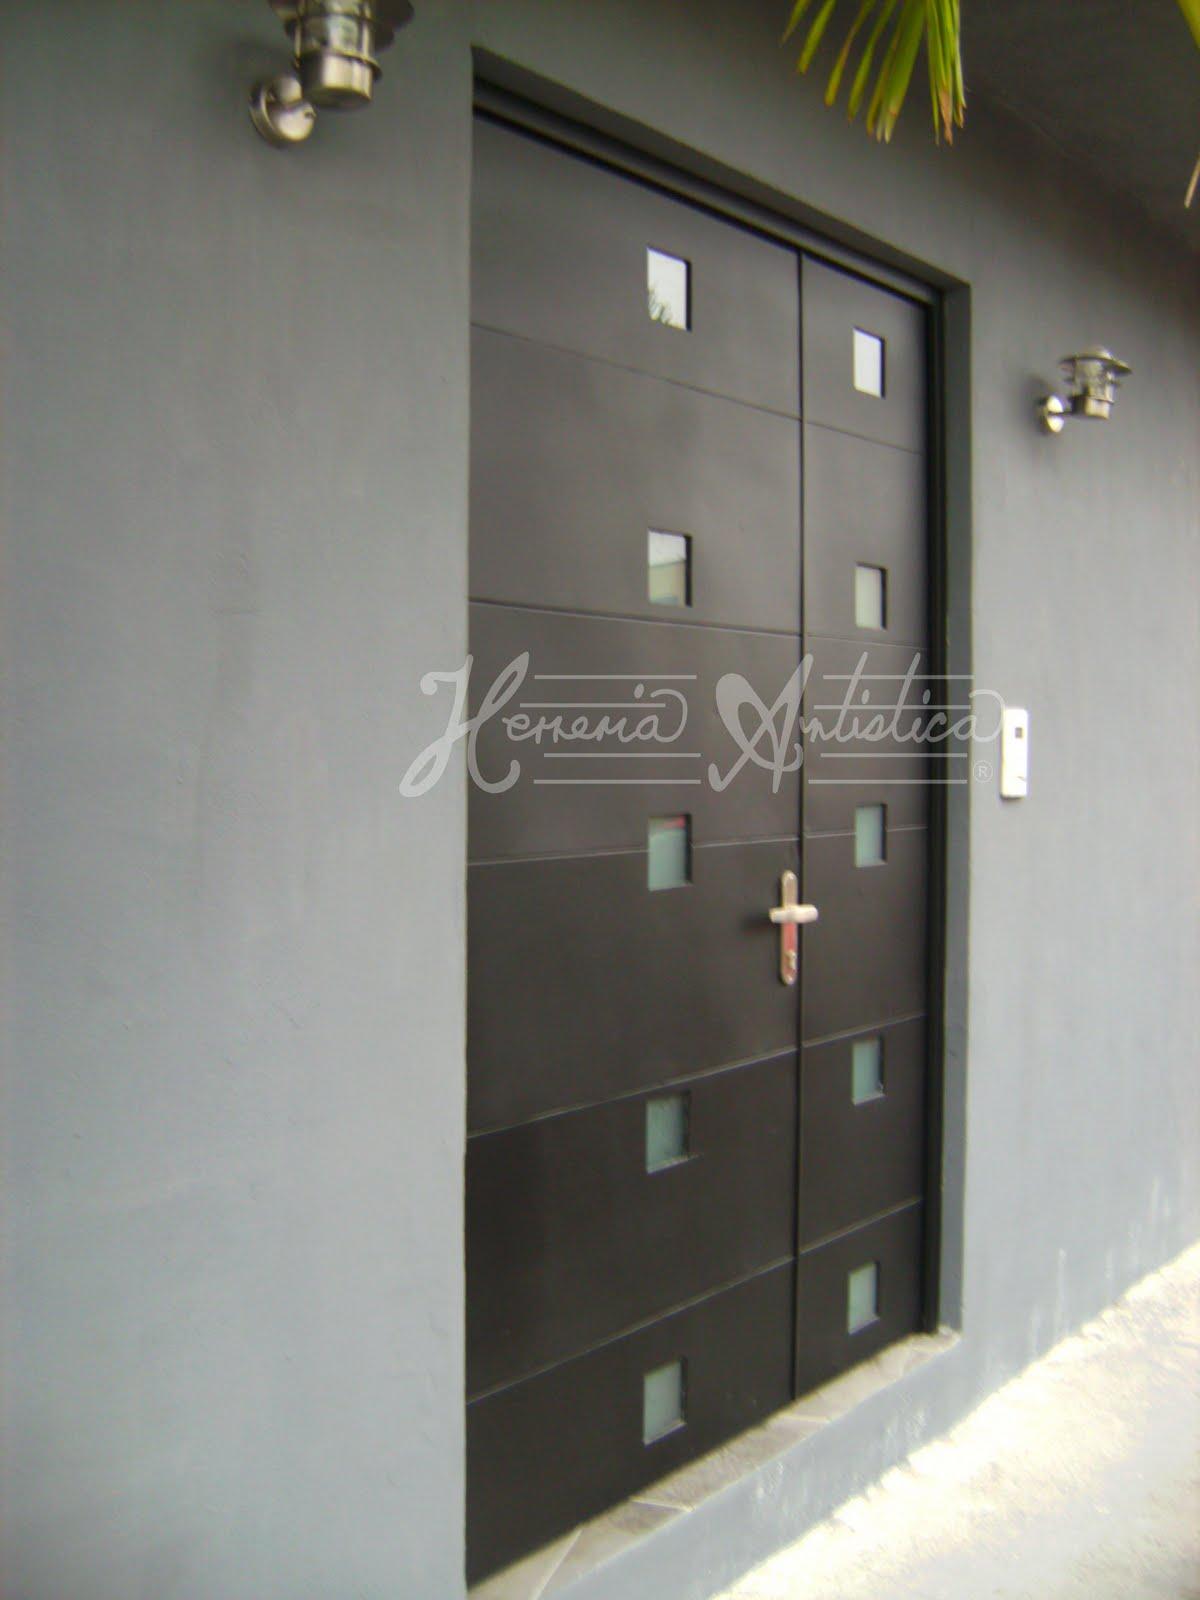 Fotos de puertas de herreria modernas - Fotos de puertas ...